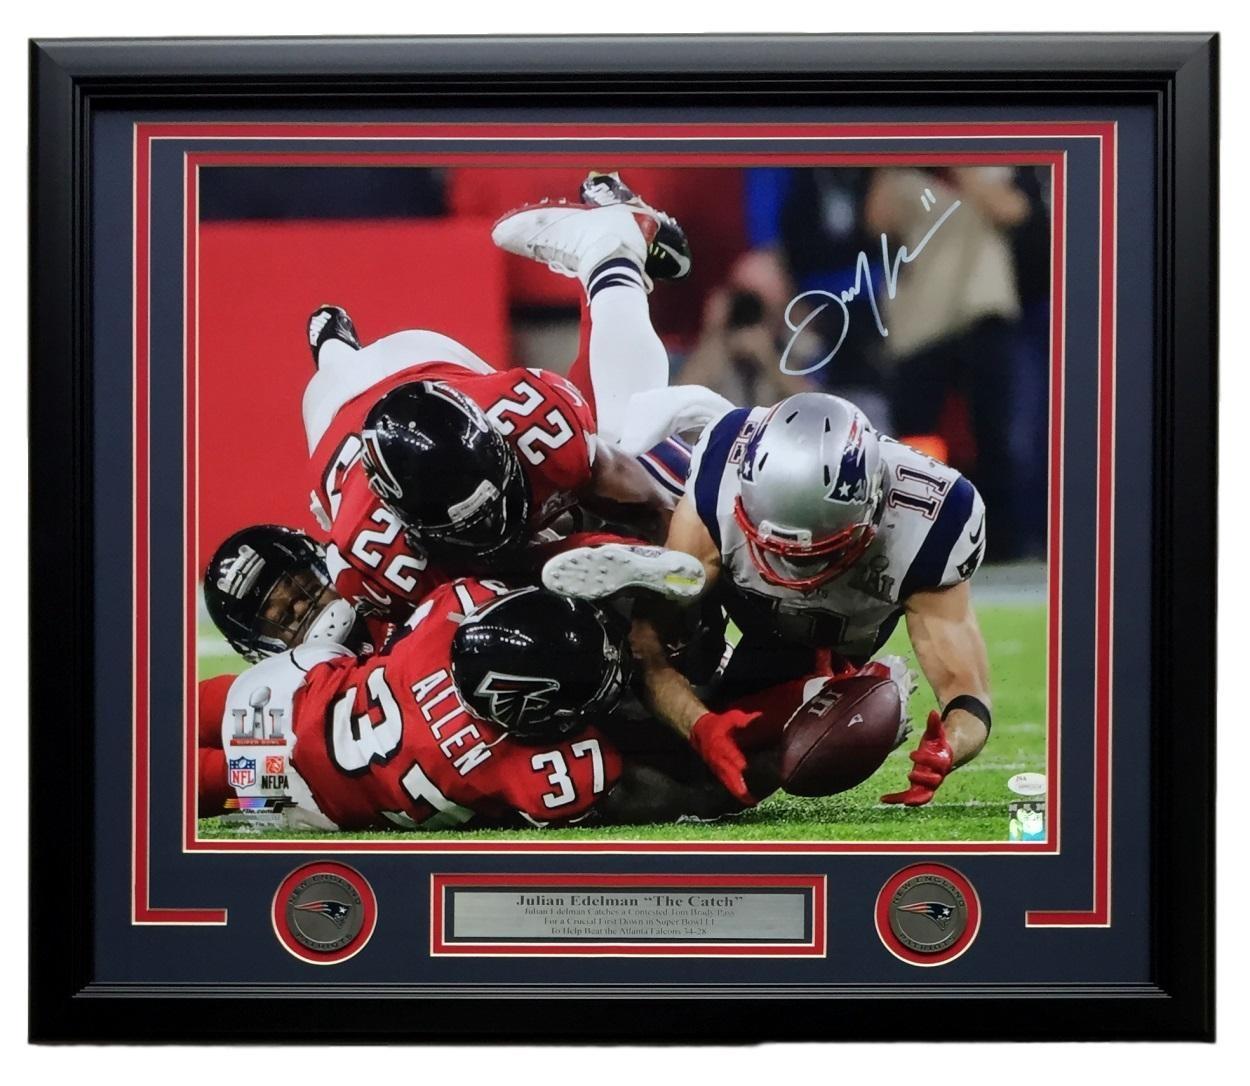 Julian Edelman Signed Framed 16x20 New England Patriots Super Bowl LI Catch  JSA 01911eab5